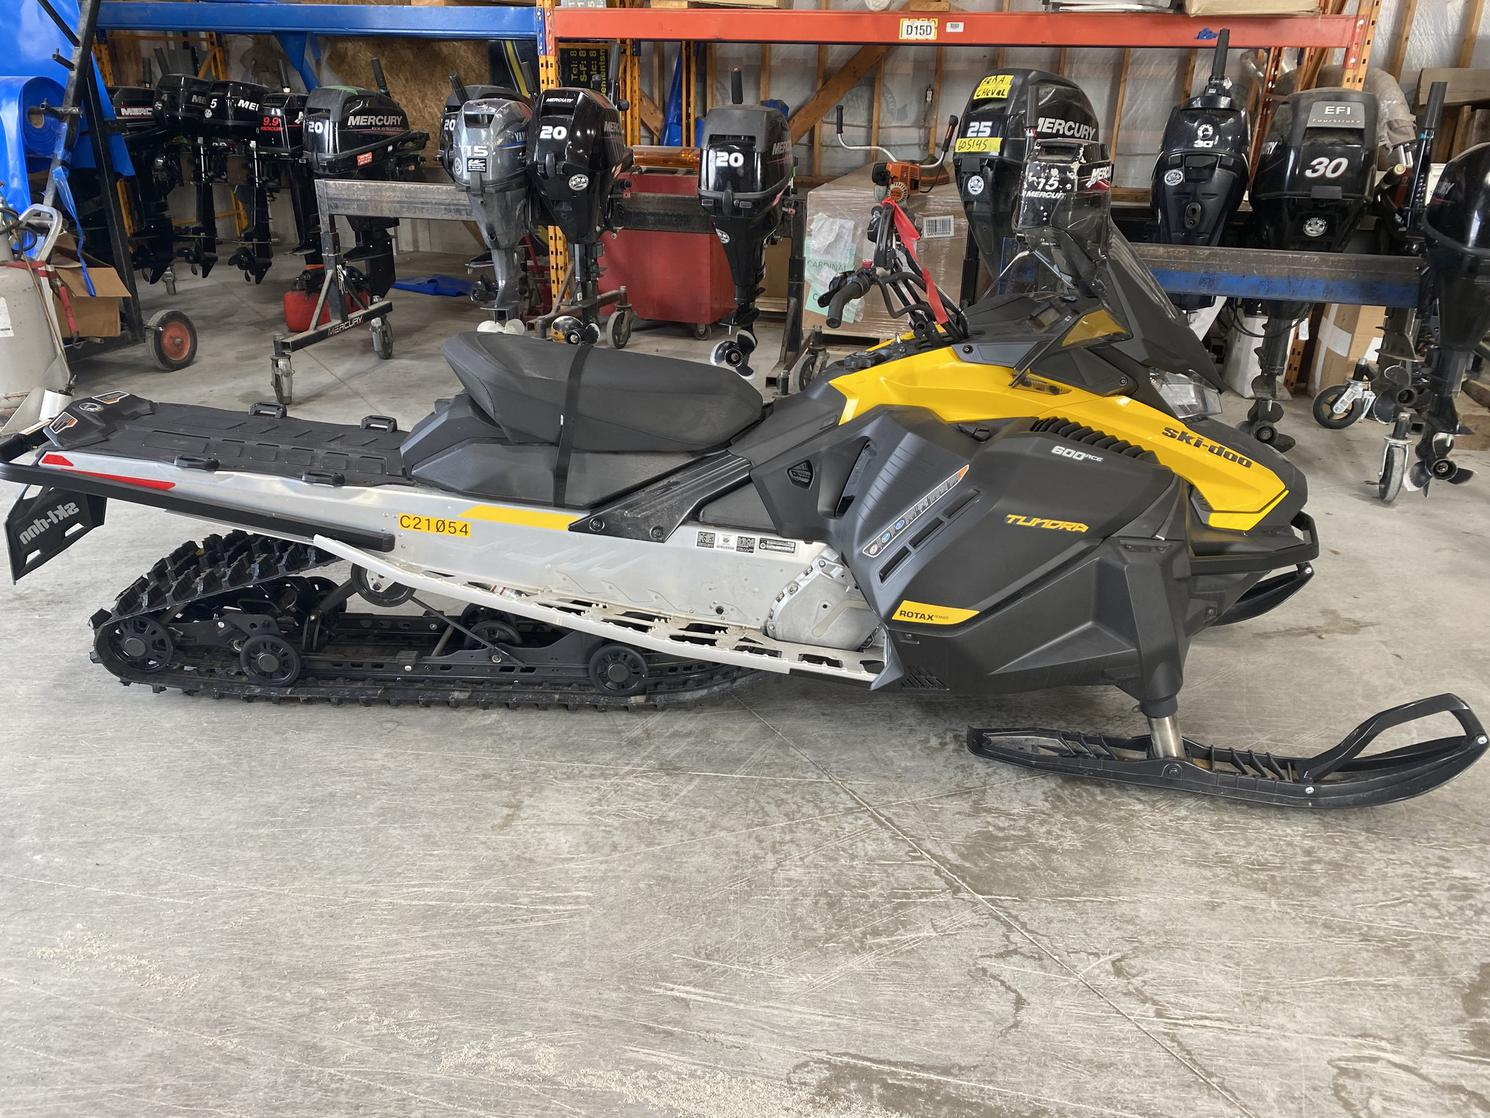 Ski-Doo TUNDRA LT 600 ACE (PRIX SUR DEMANDE) 2022